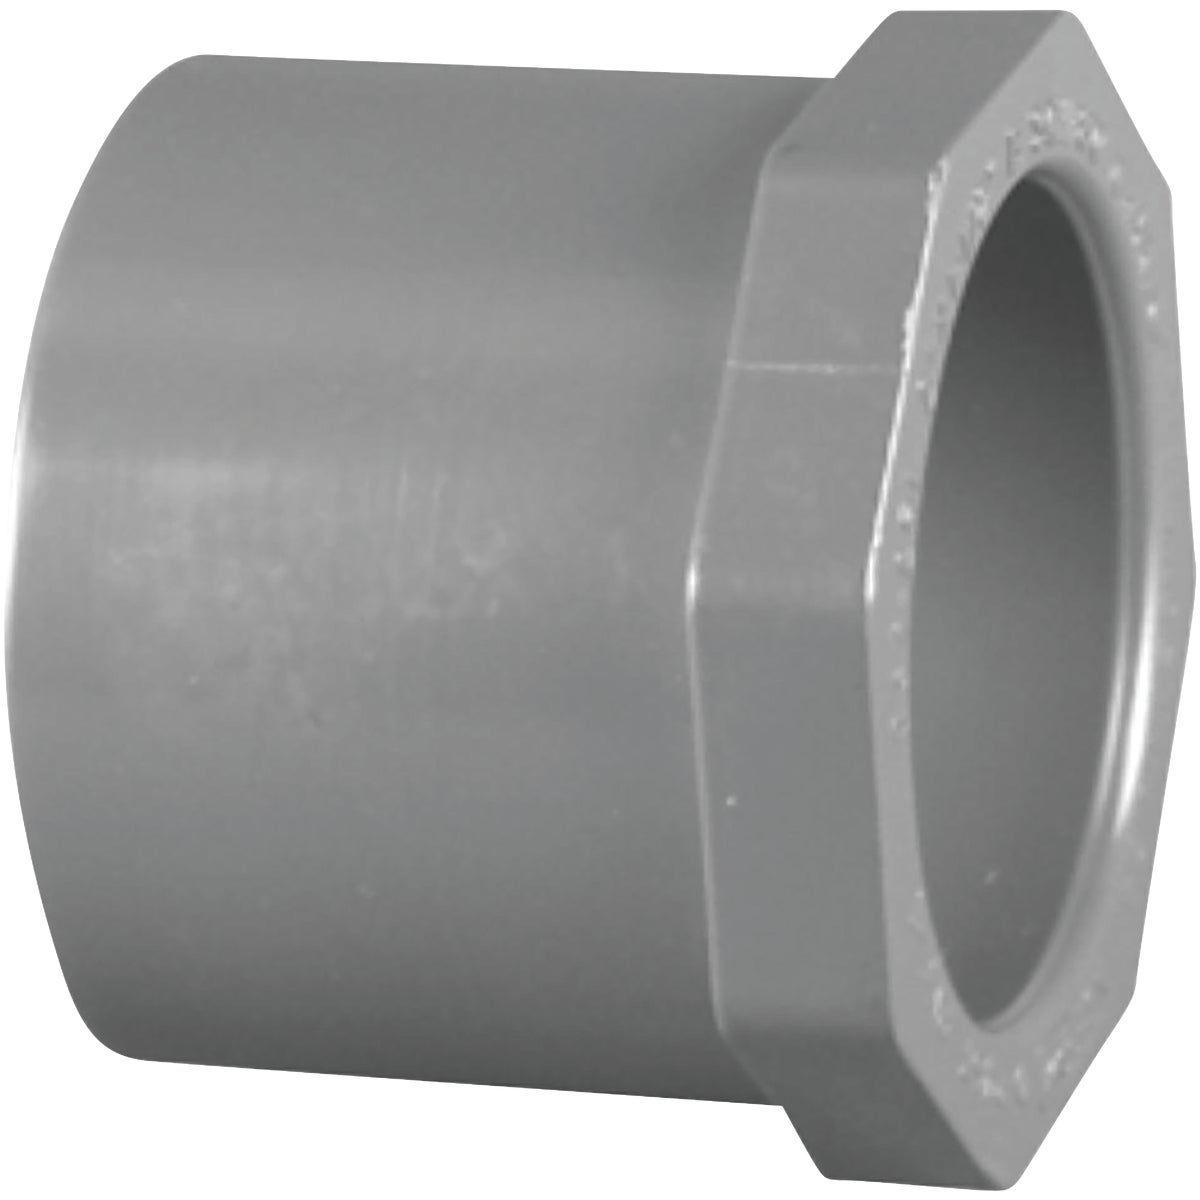 1-1/4X1 SPXS PVC BUSHING